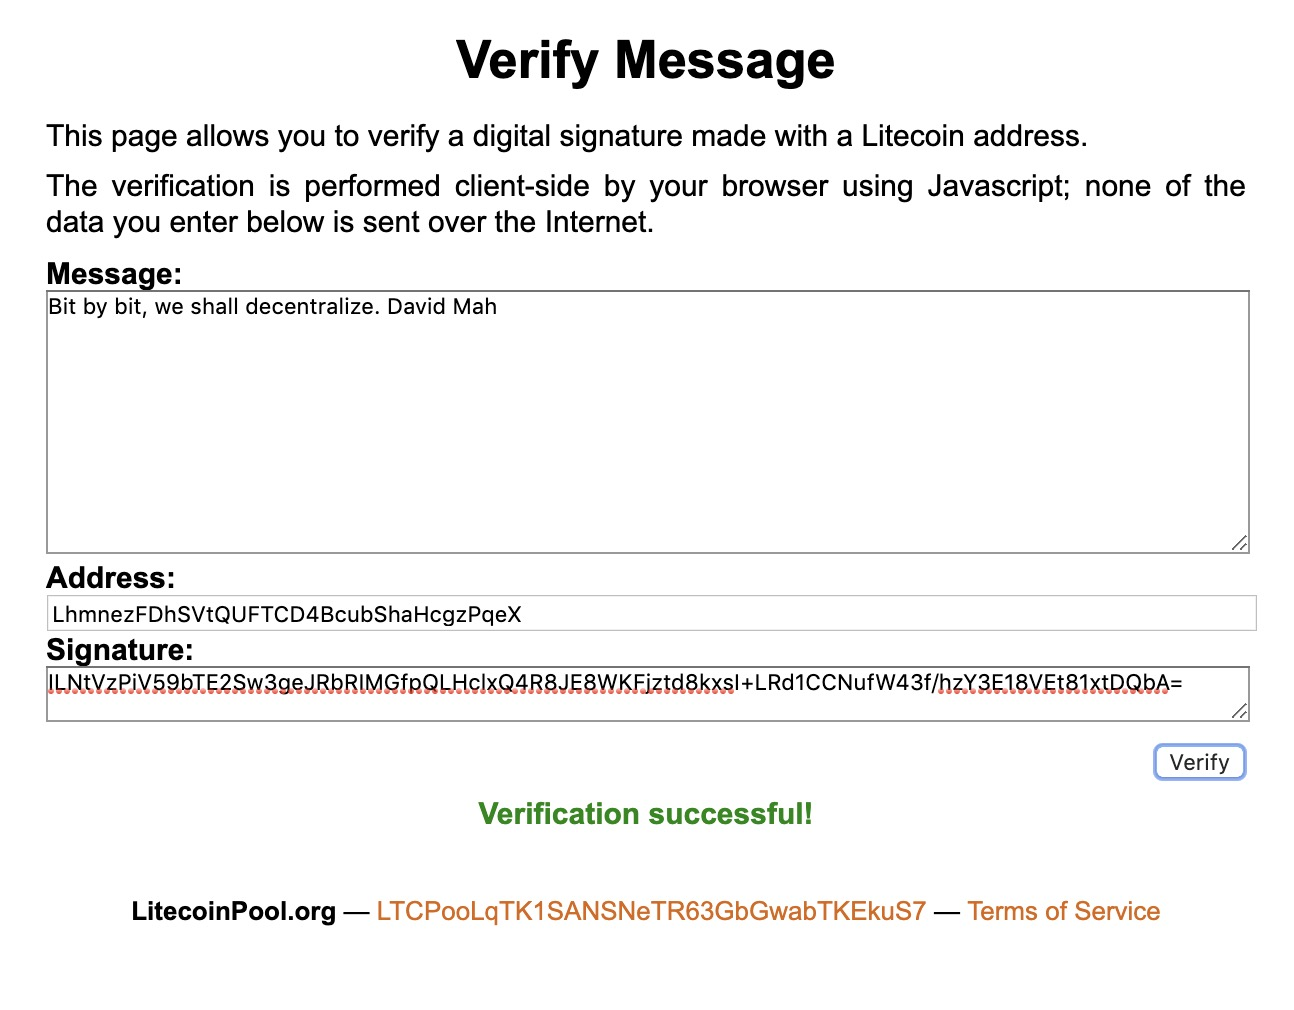 Verified Litecoin message